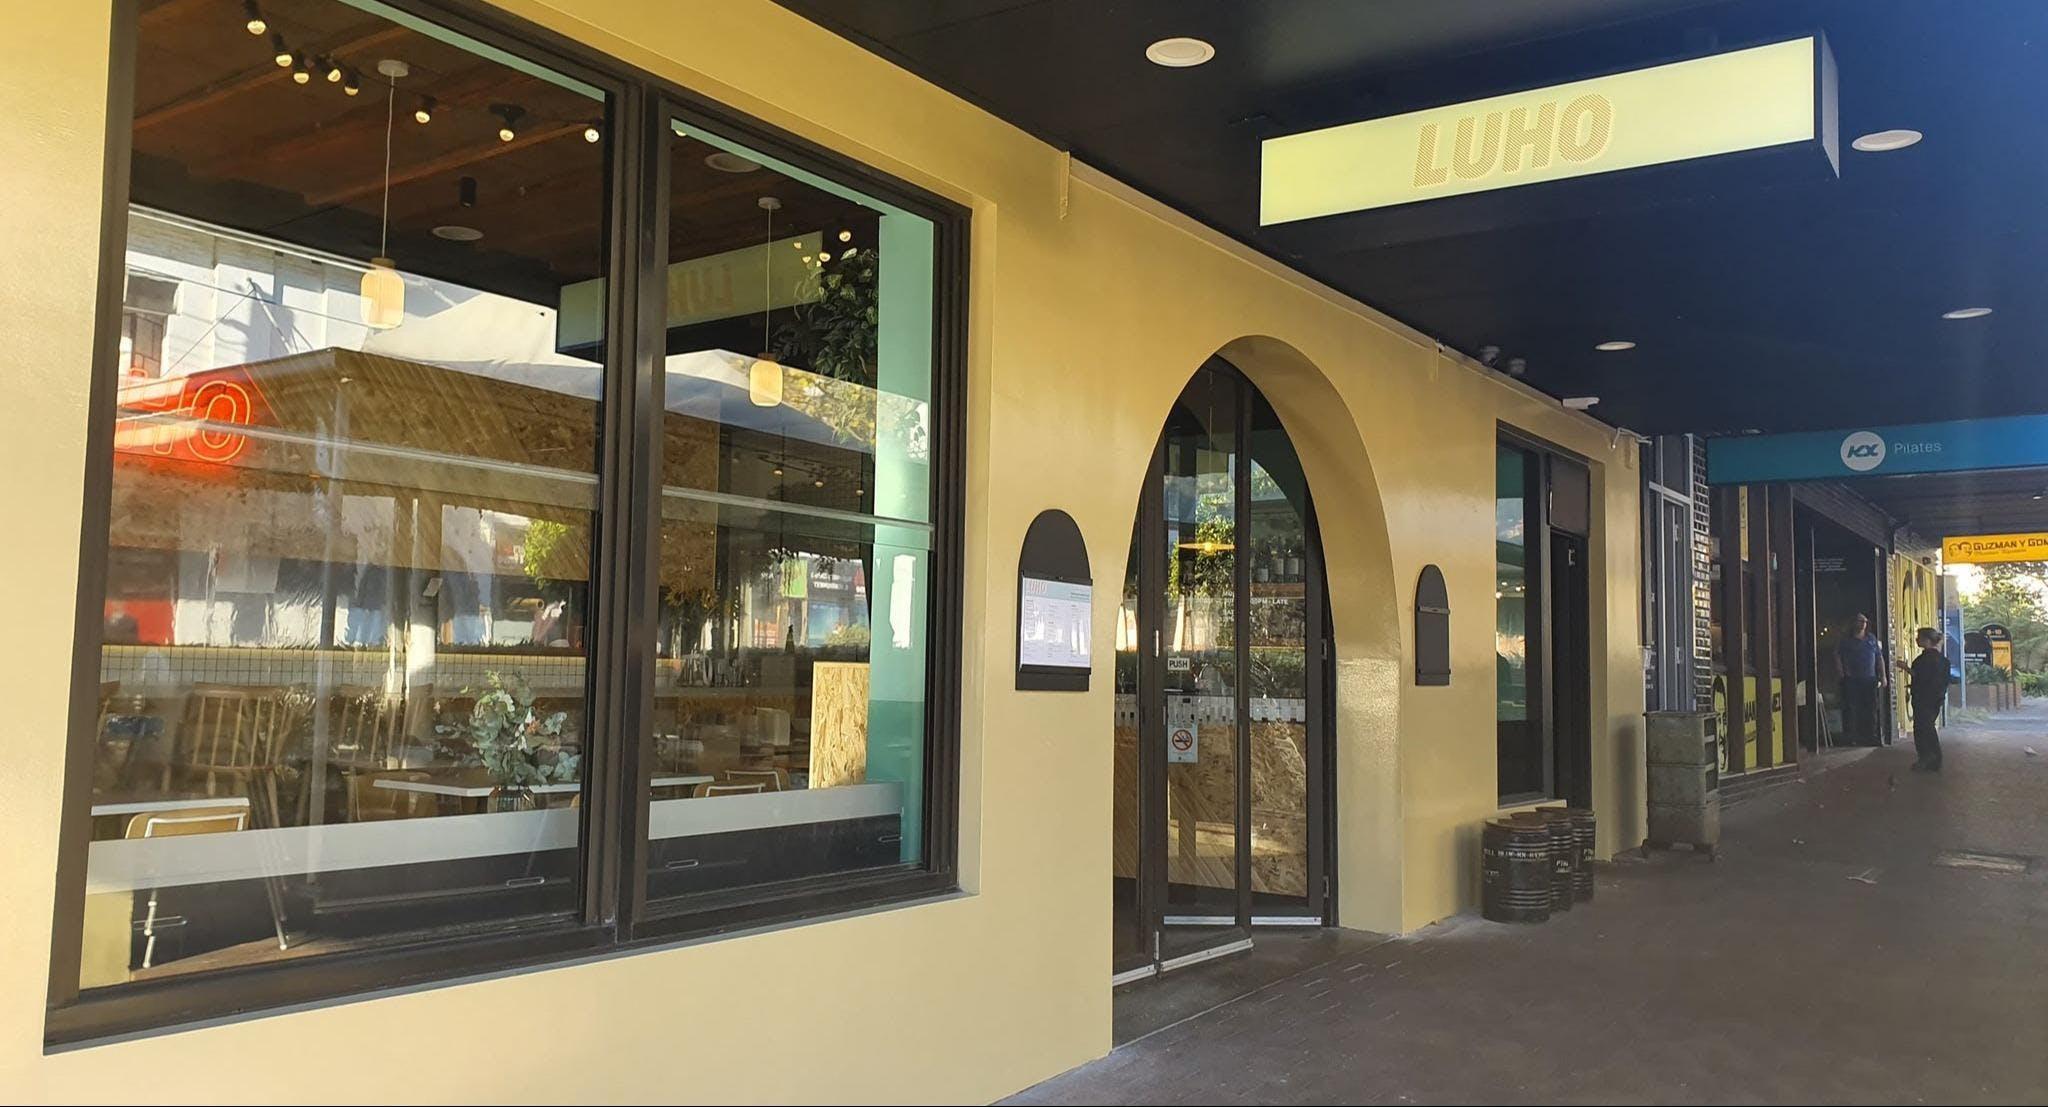 Luho Restaurant